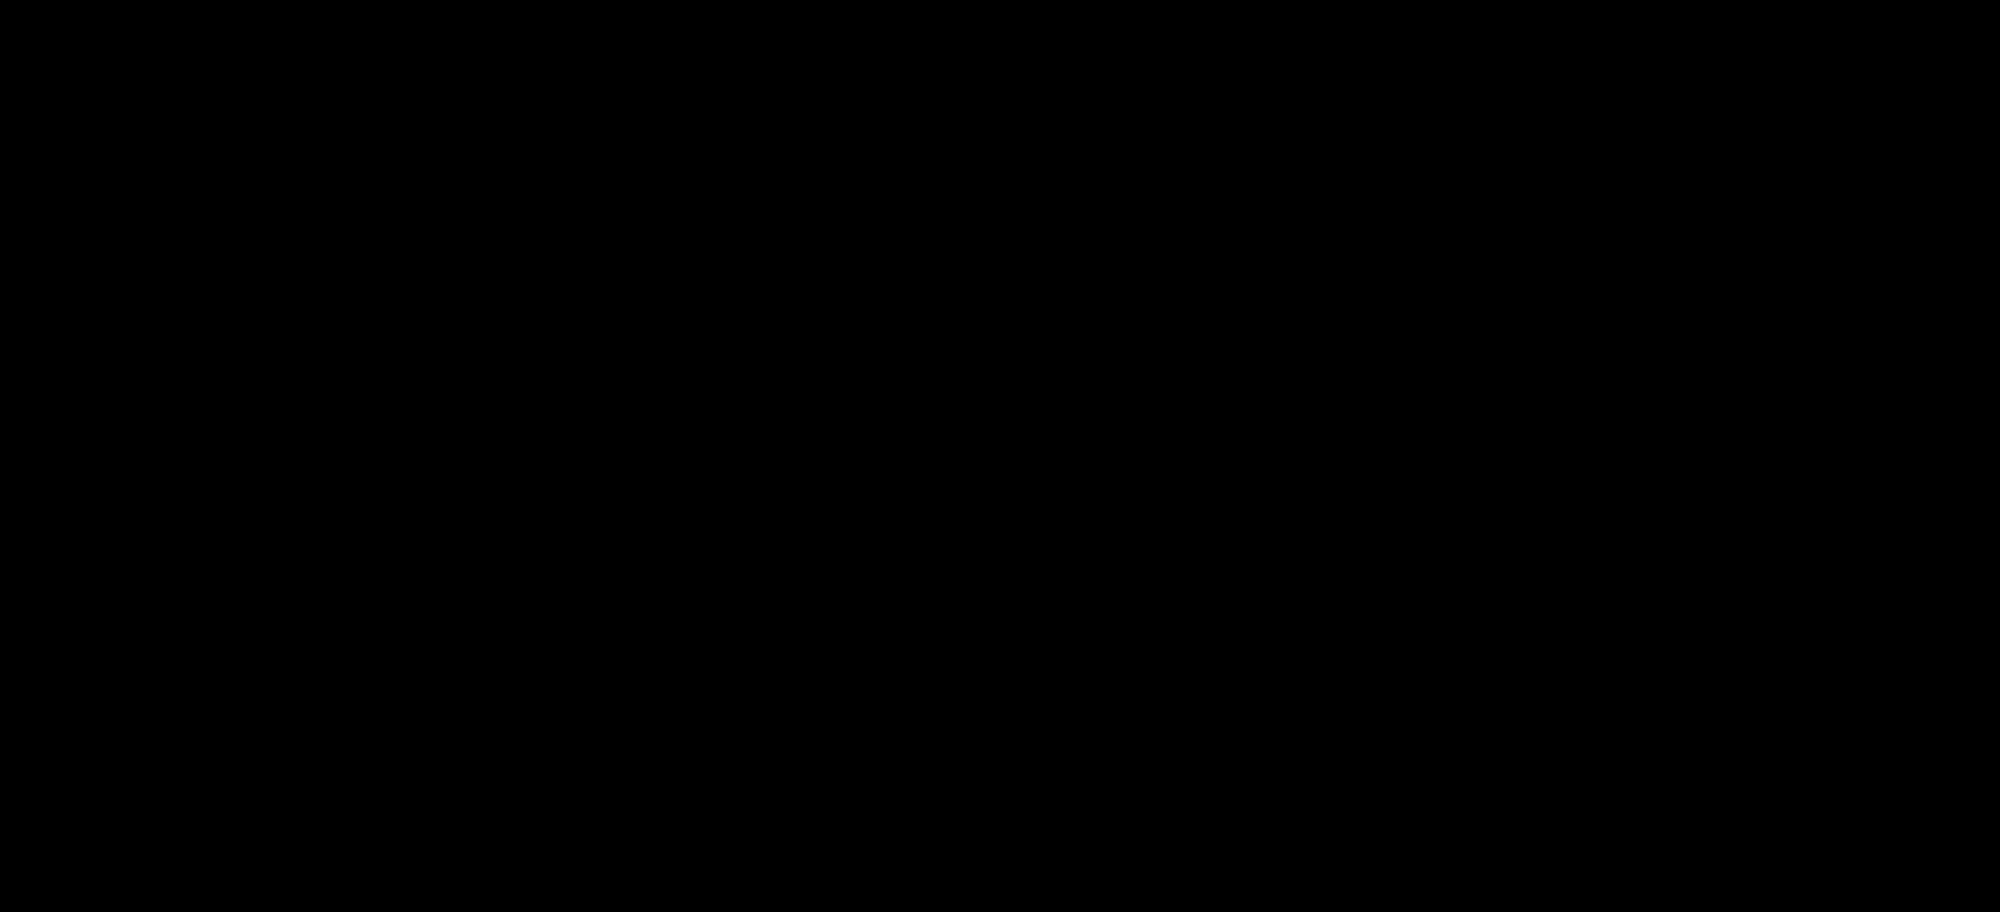 PRELOVED CHICA-logo-black.png